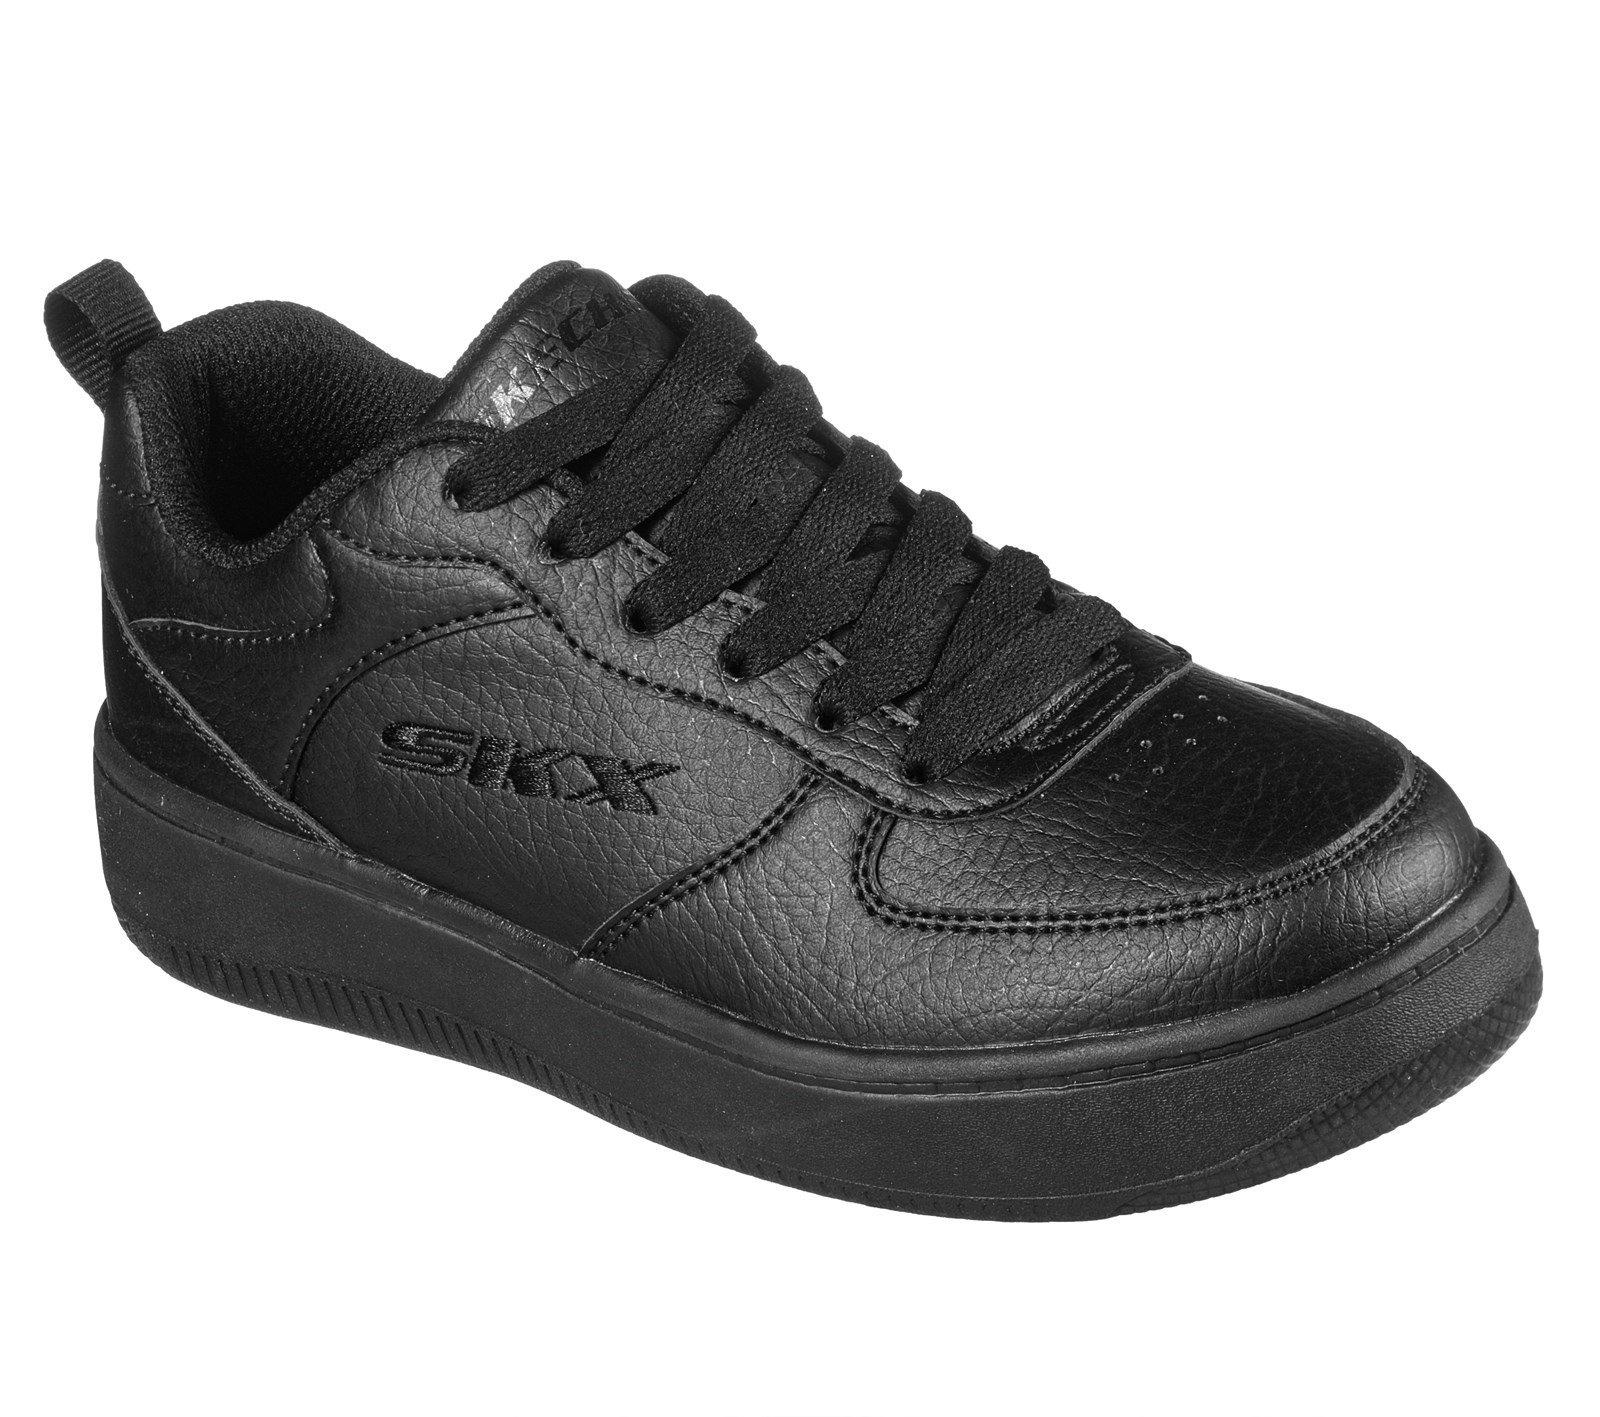 Skechers Kid's Sport Court 92 School Trainer Black 32519 - Black/Black 13